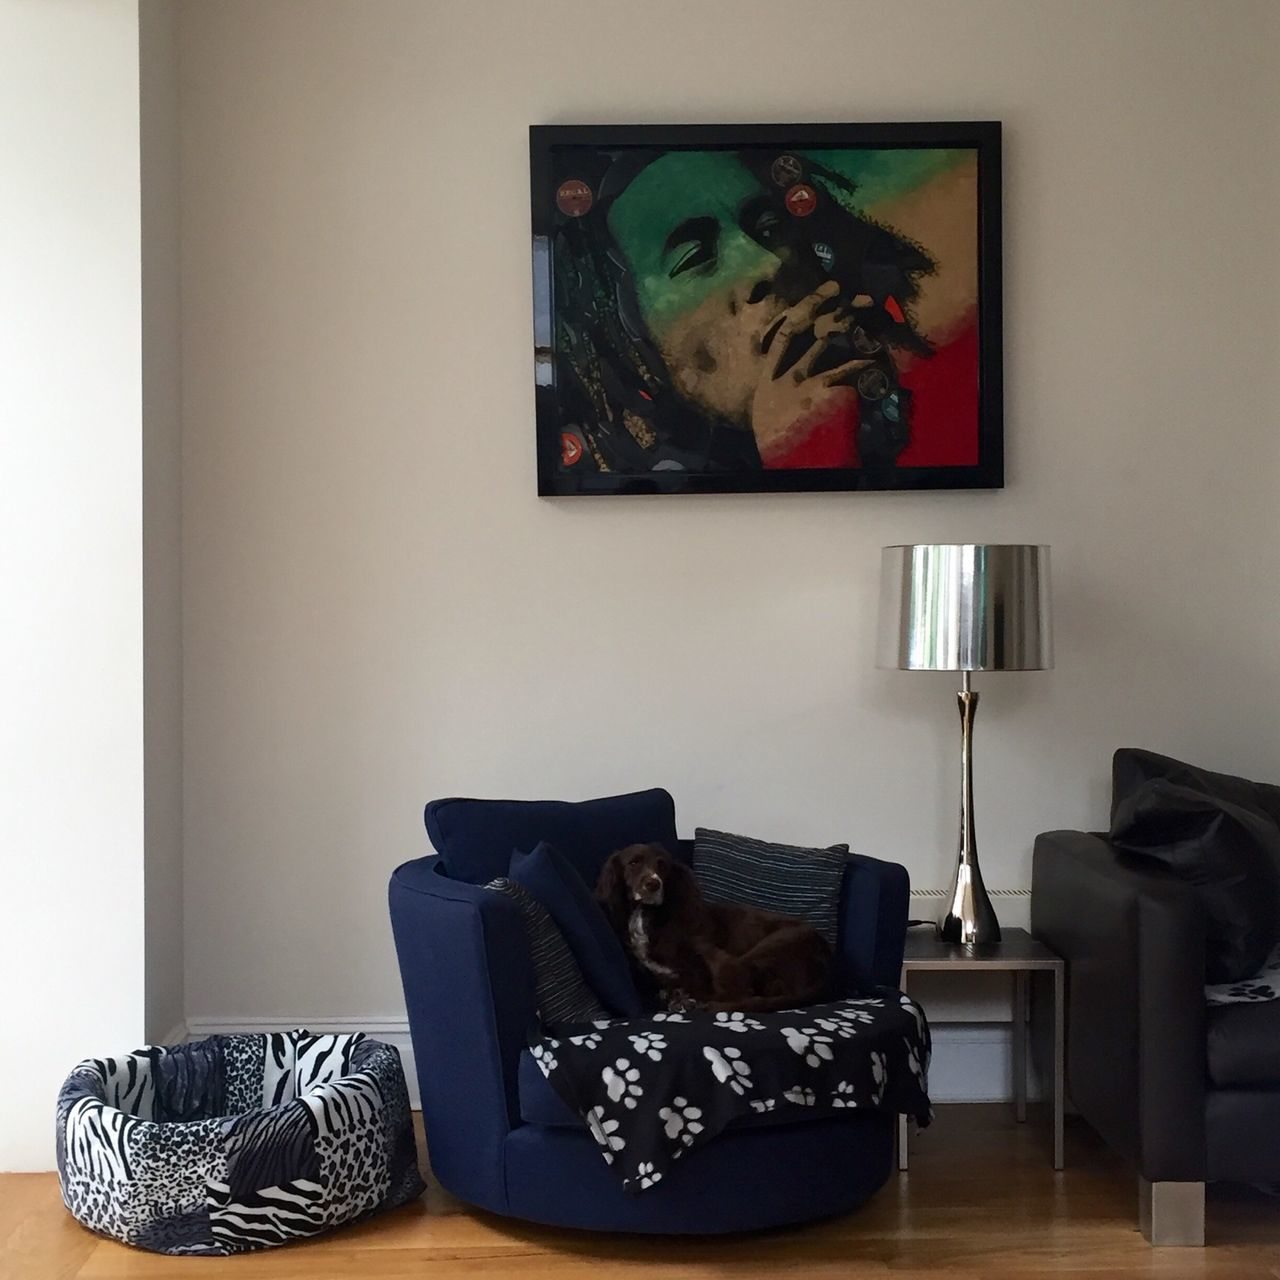 Bob Marley RASTA Modern Architecture Modern Living London Home Interior Design Dog Puppy Sofa Lamp